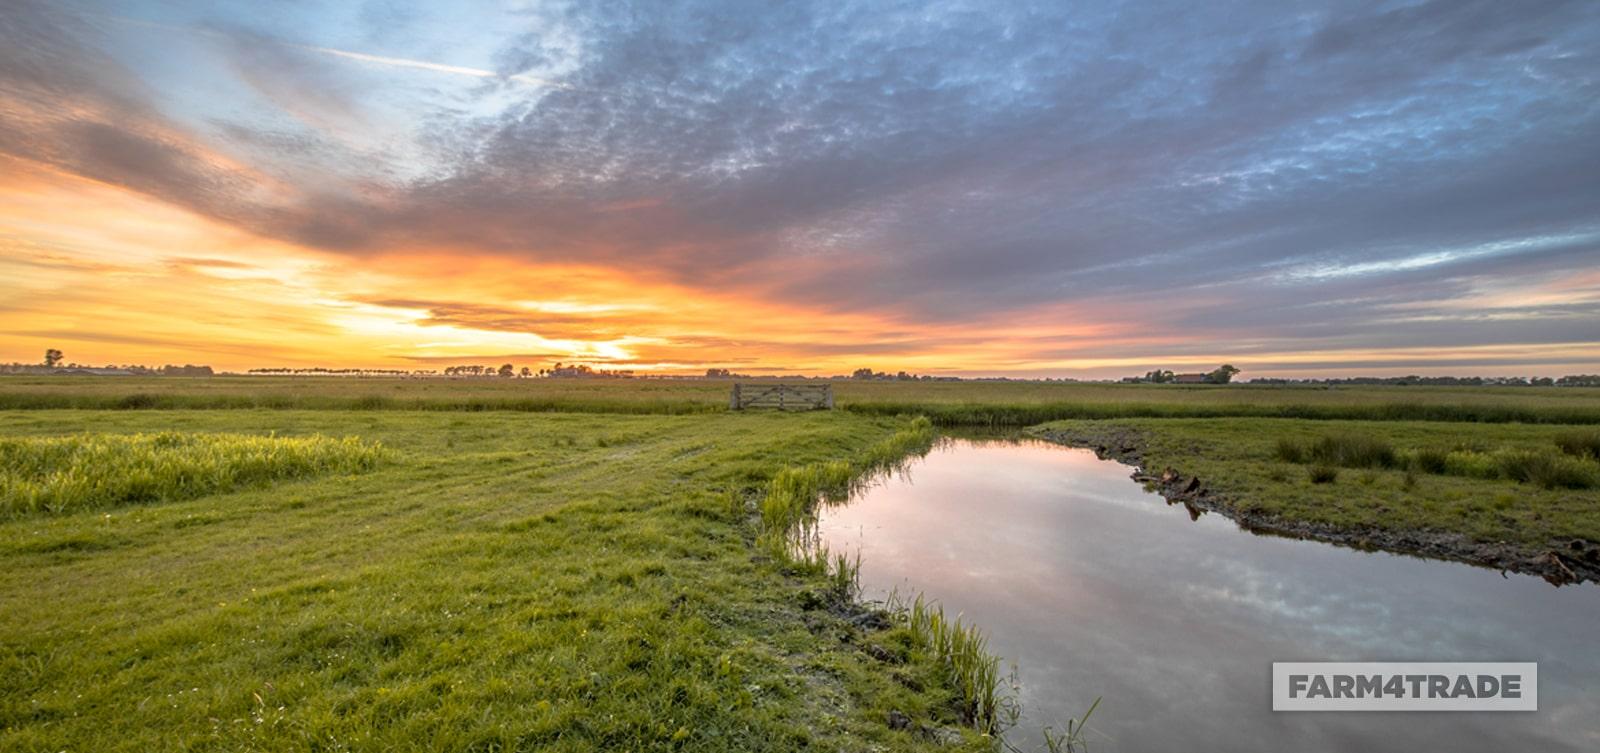 farmland is an increasingly valuable asset - Farm4Trade